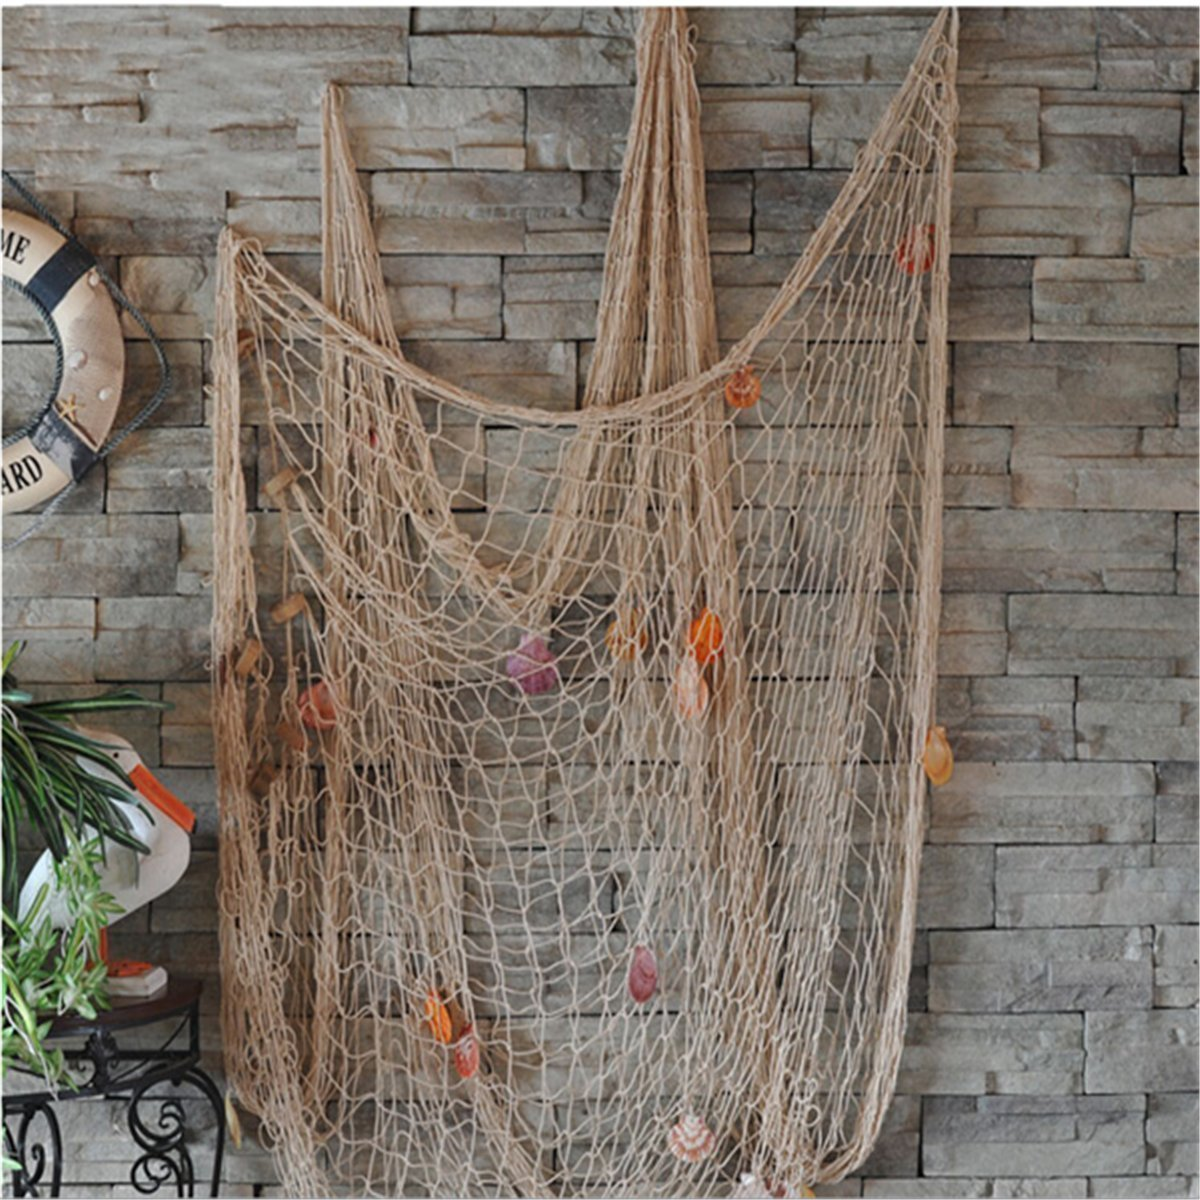 Youbedo Nautical Fish Net With Shells Decoration Retro Photography Props Creamy White Mediterranean Style Fish Net Decor 79 x 59inch Loririri